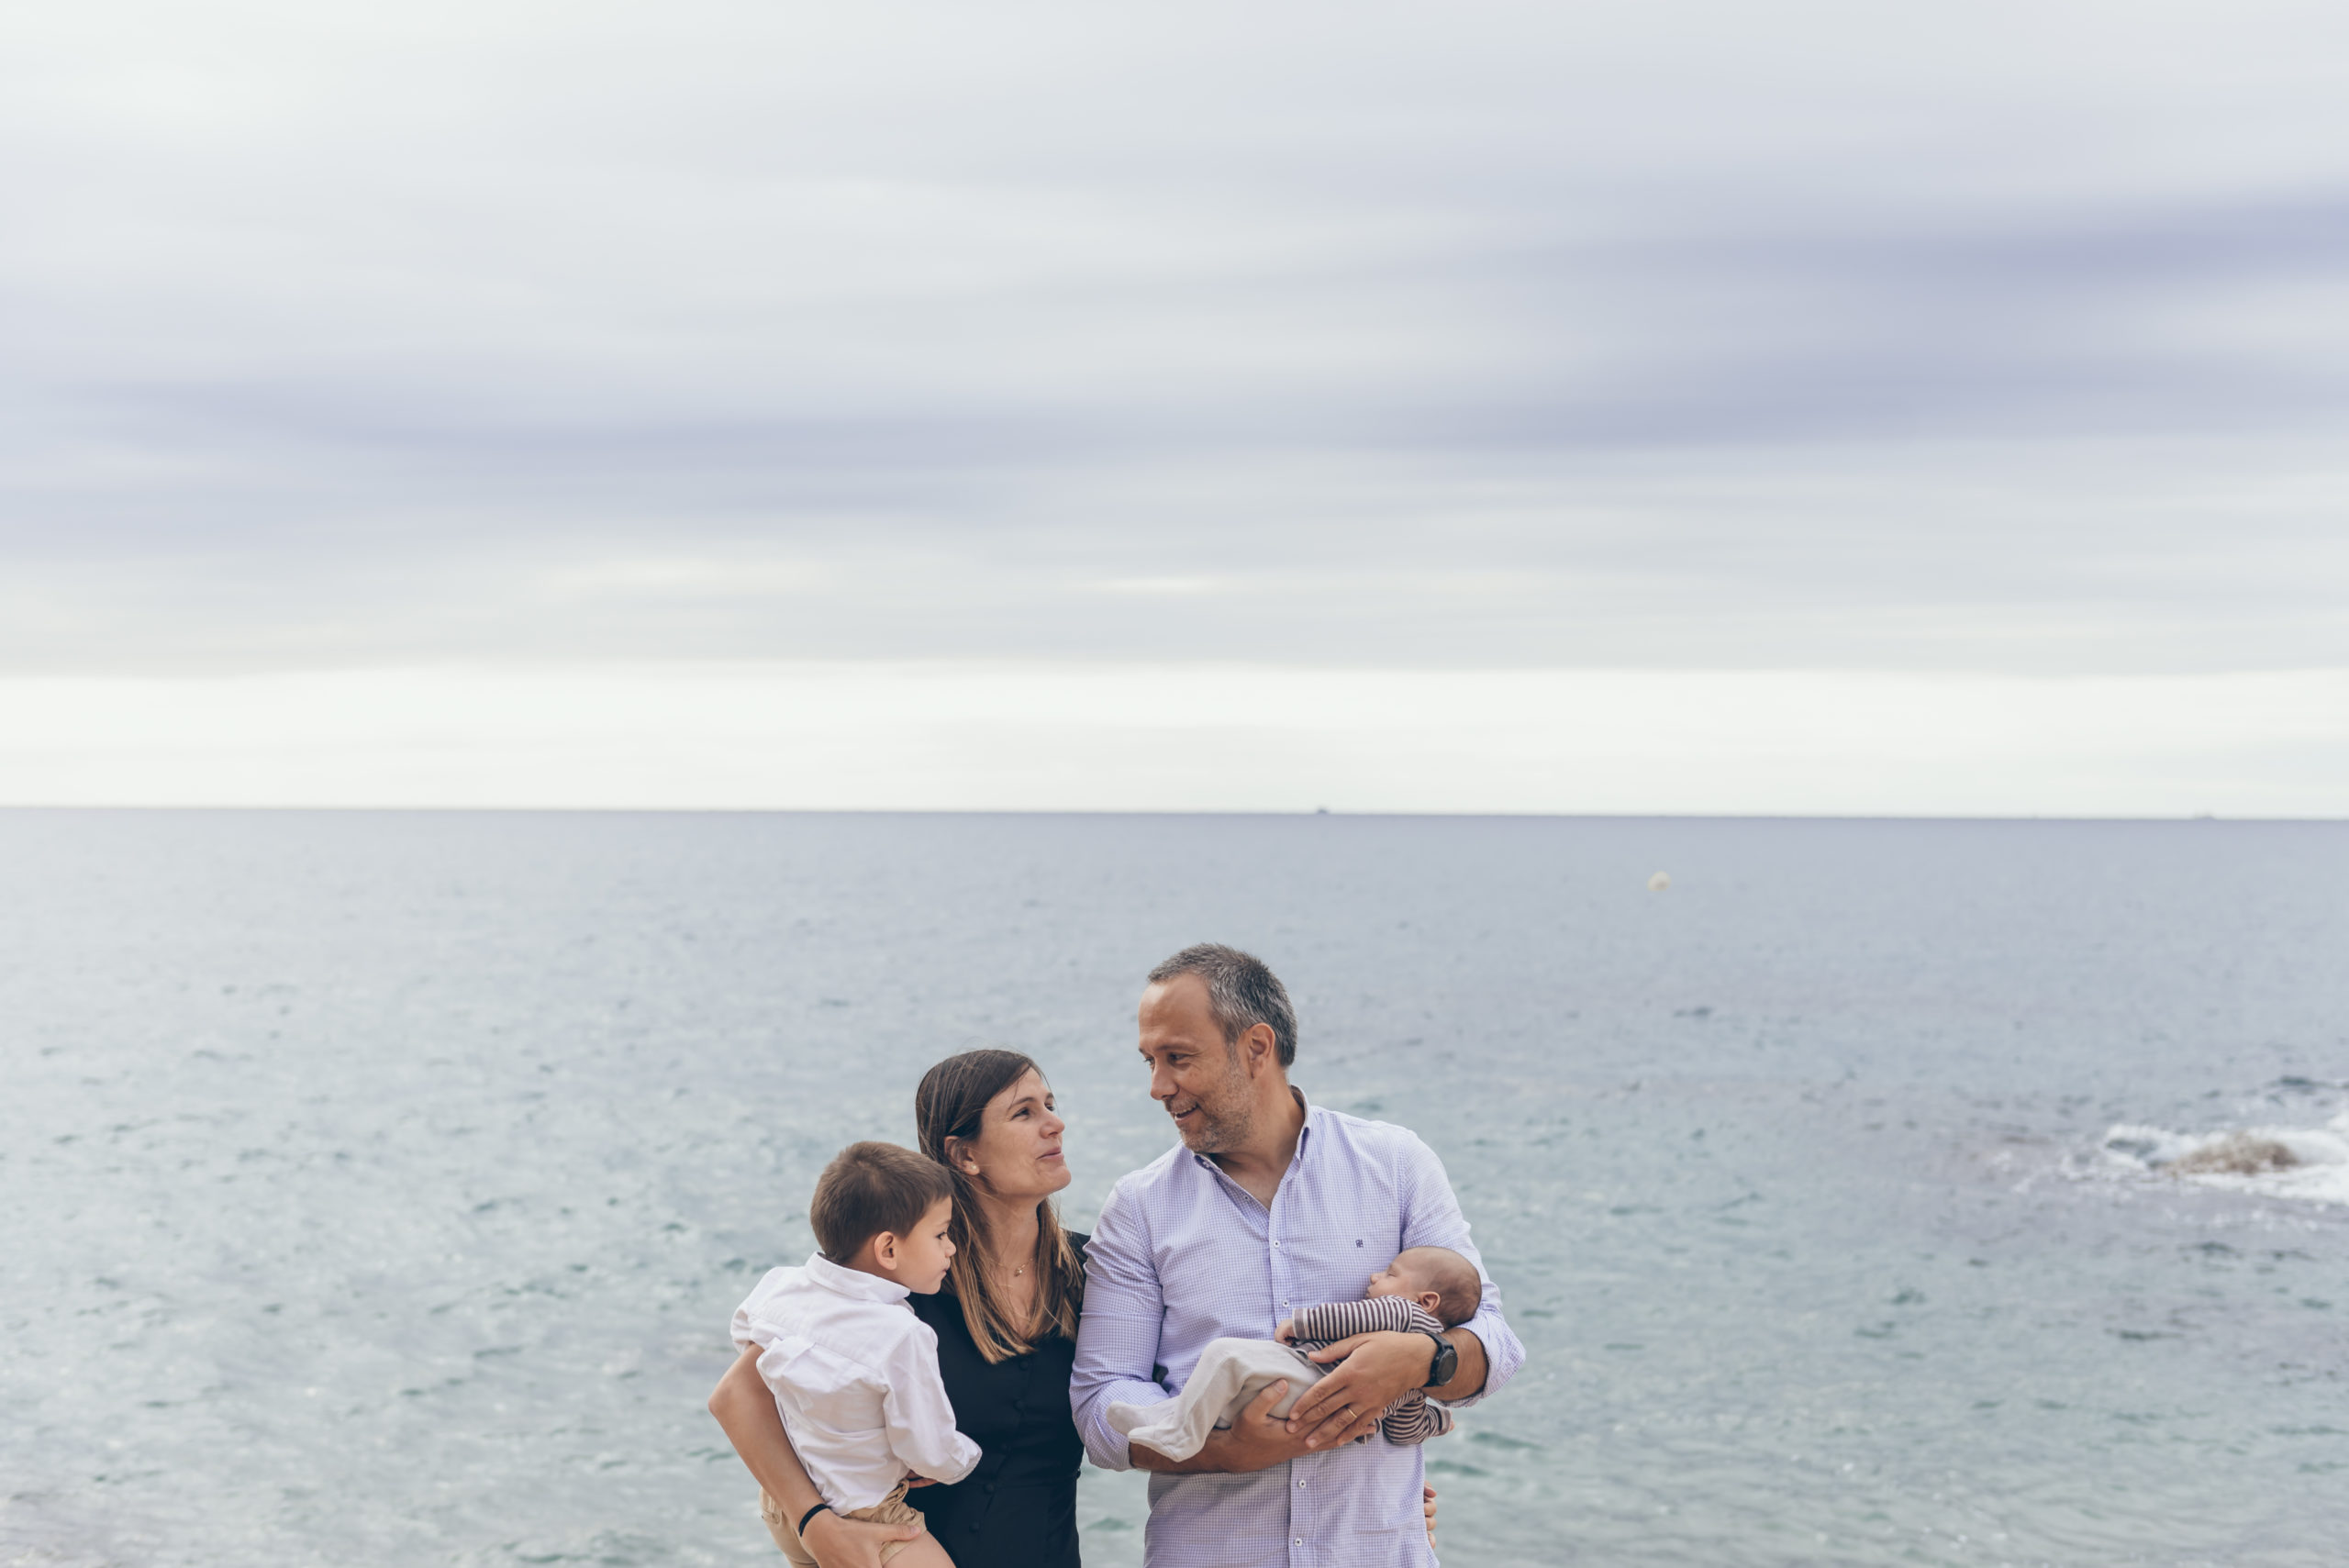 helena-molinos-fotografia-exterior-mar-familia